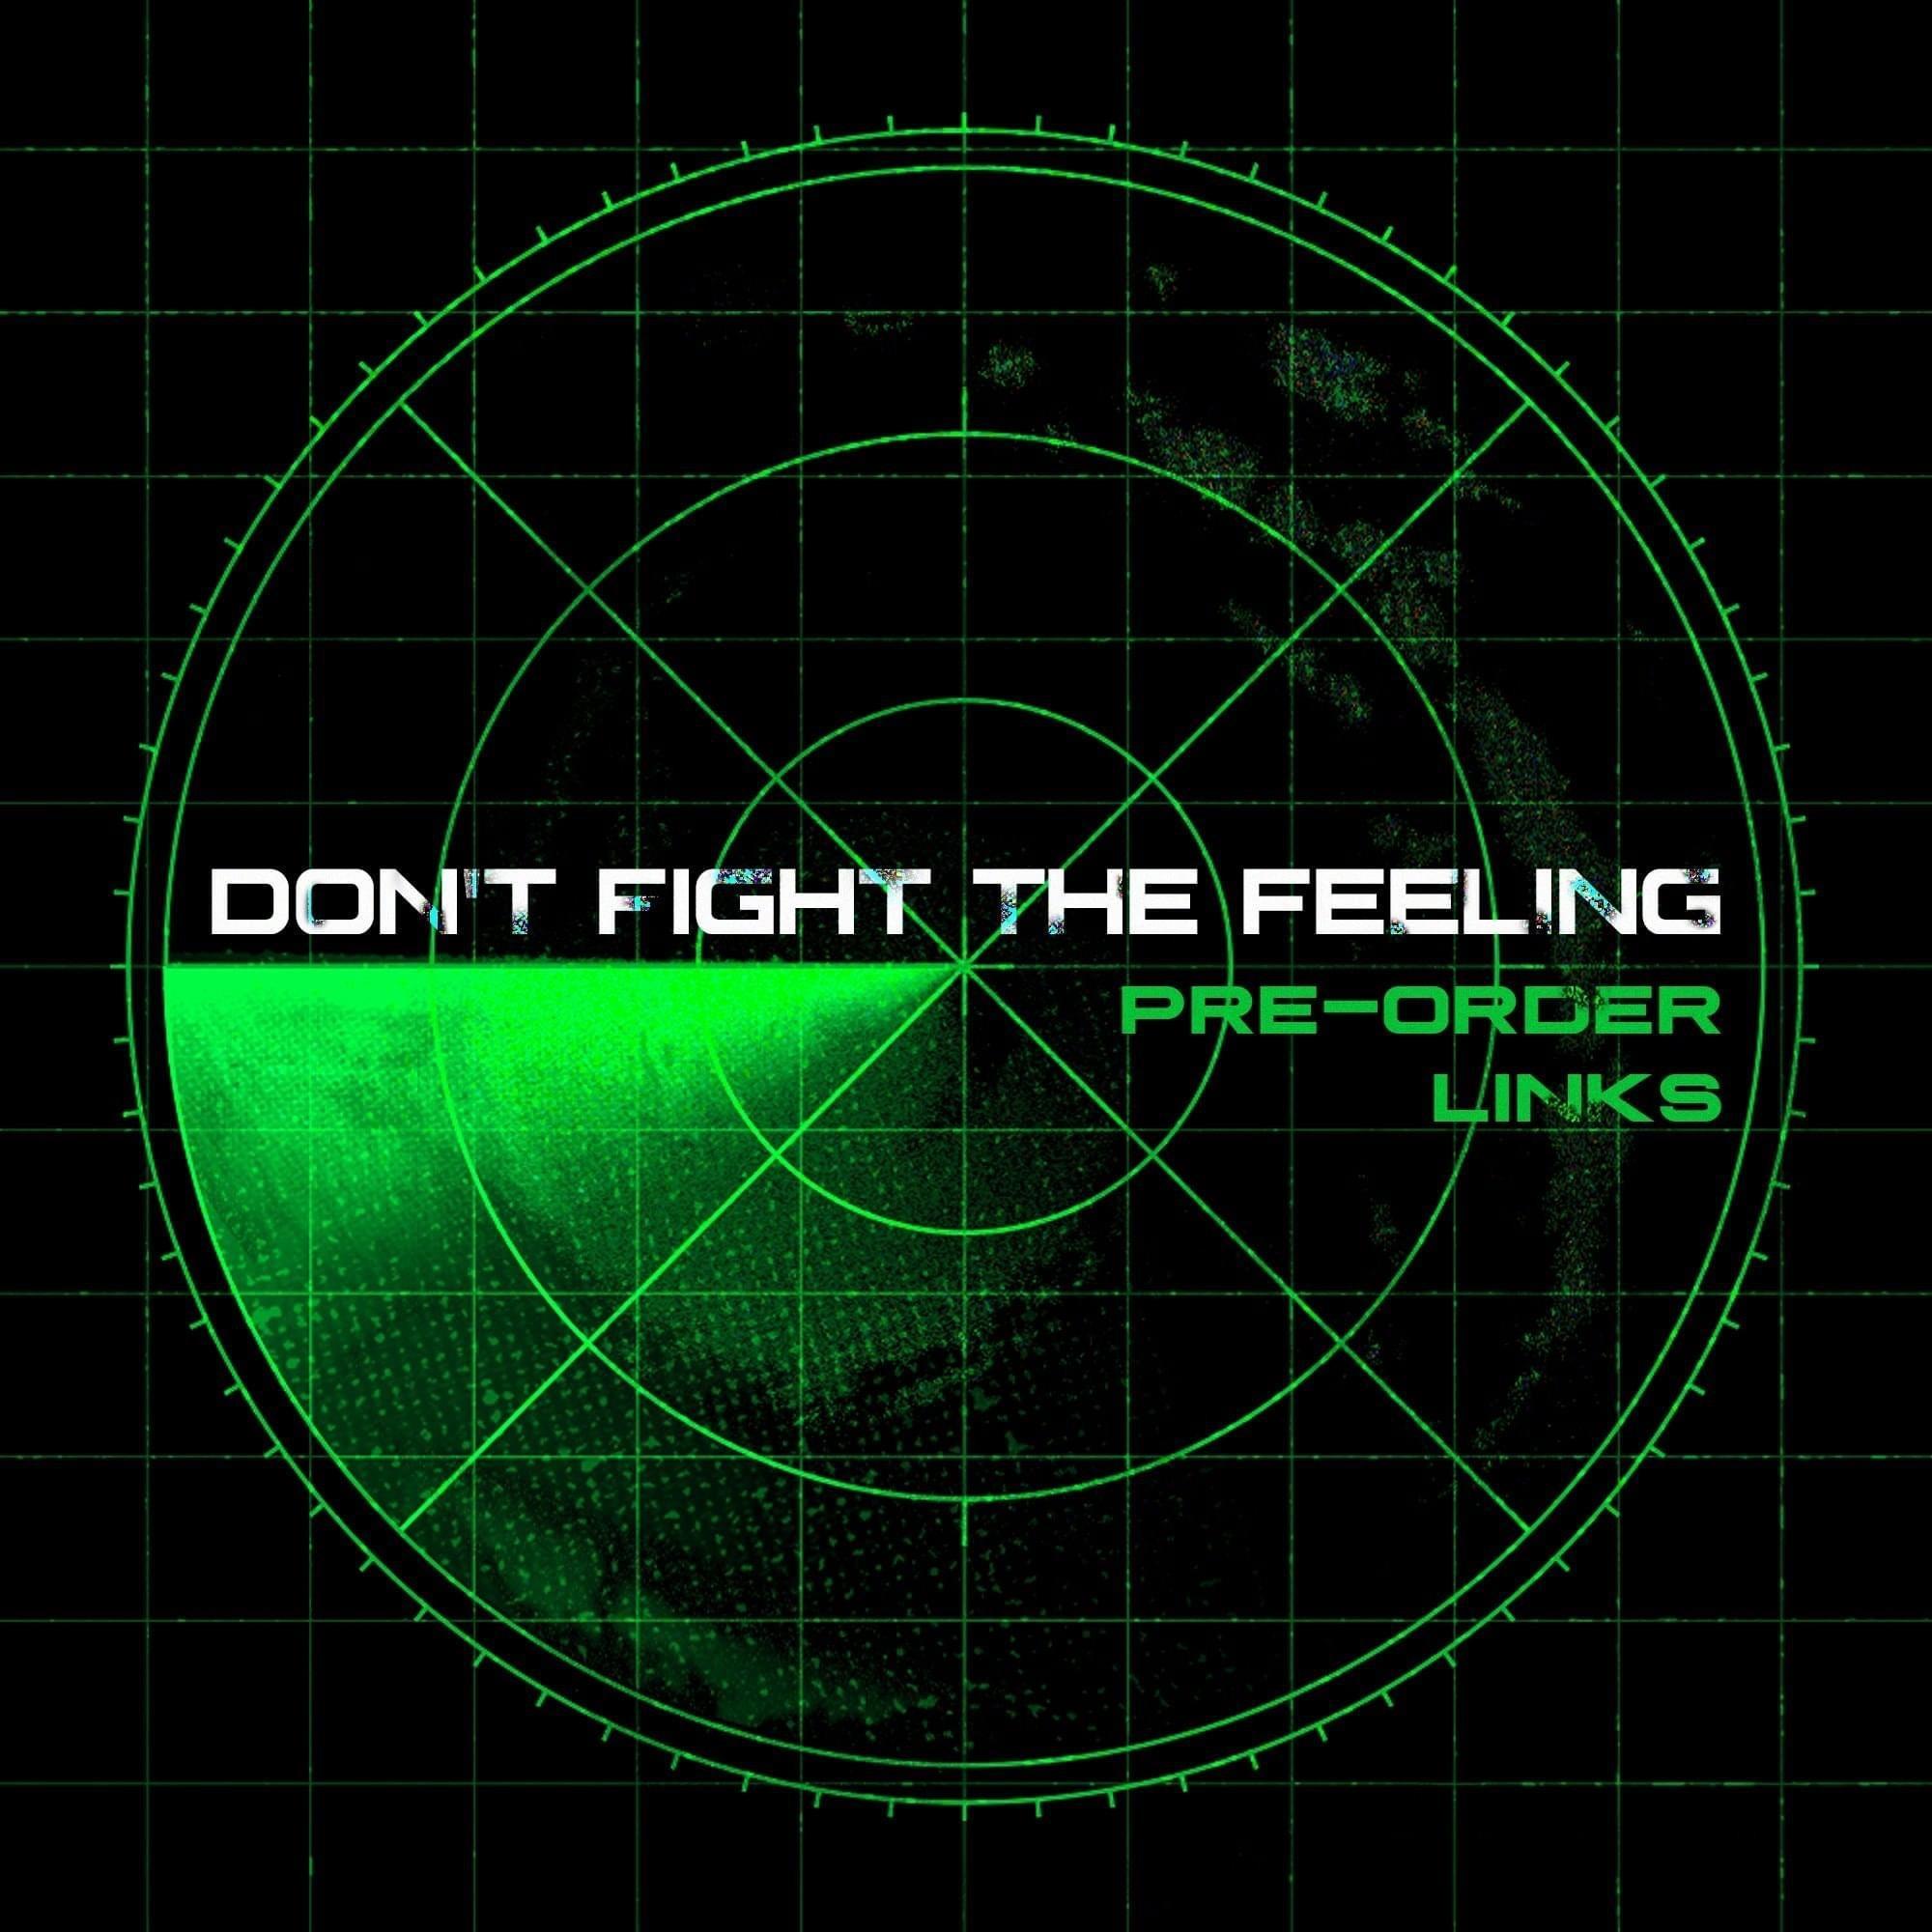 متن آلبوم Don't fight the feeling از اکسو